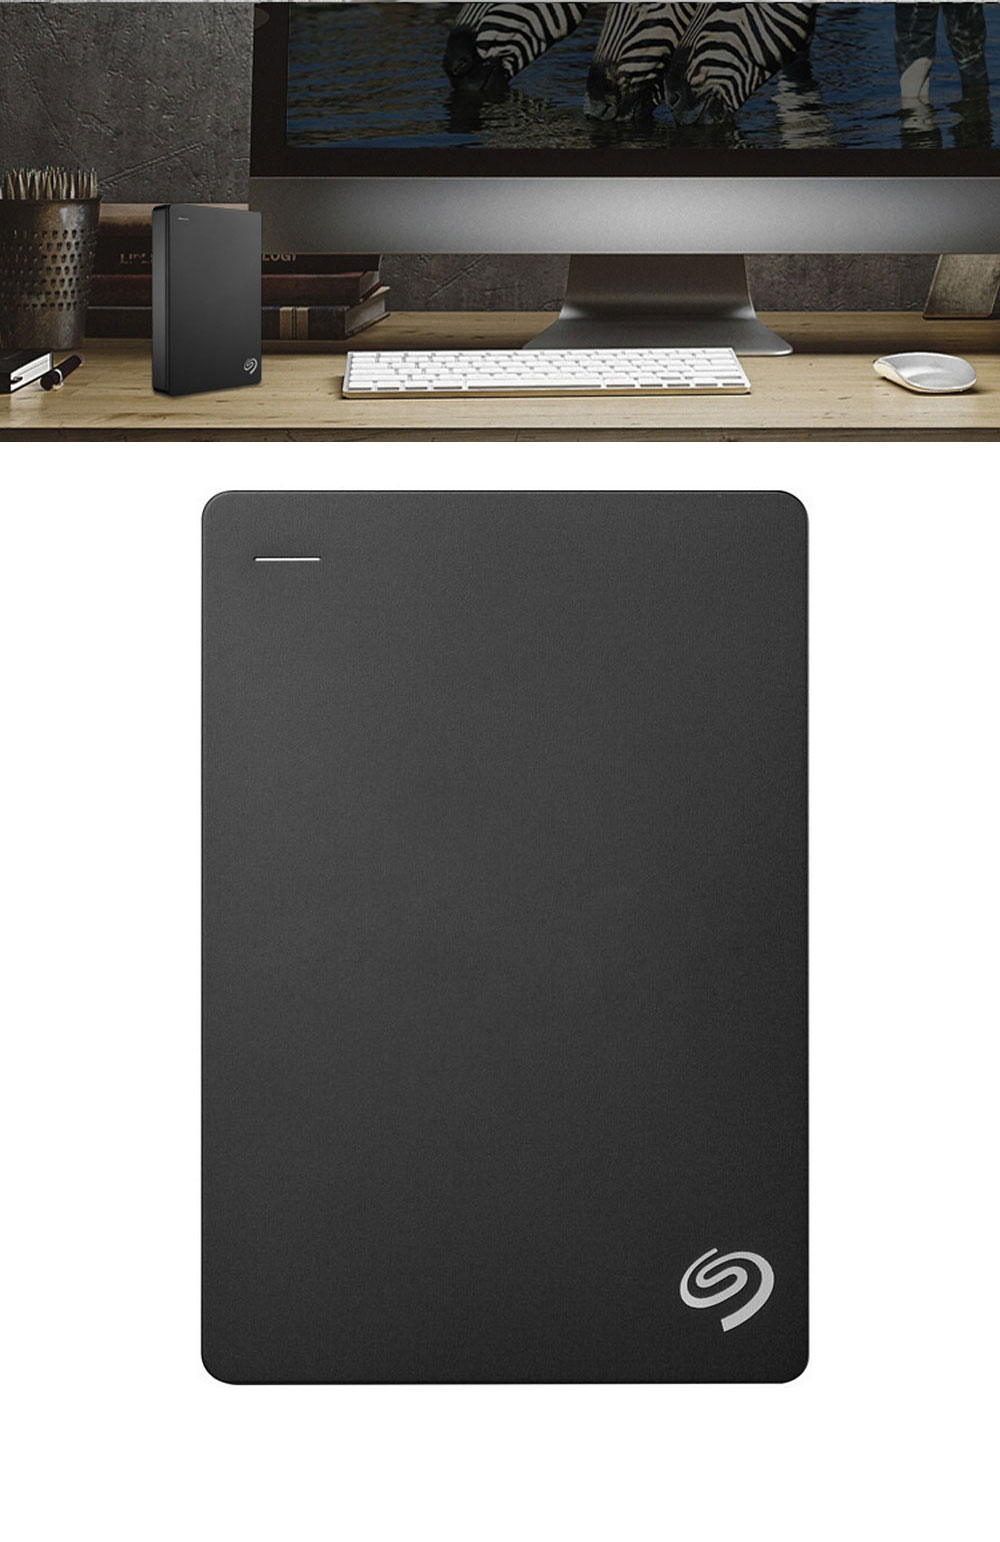 Seagate-External-HDD-Disk-1TB_05